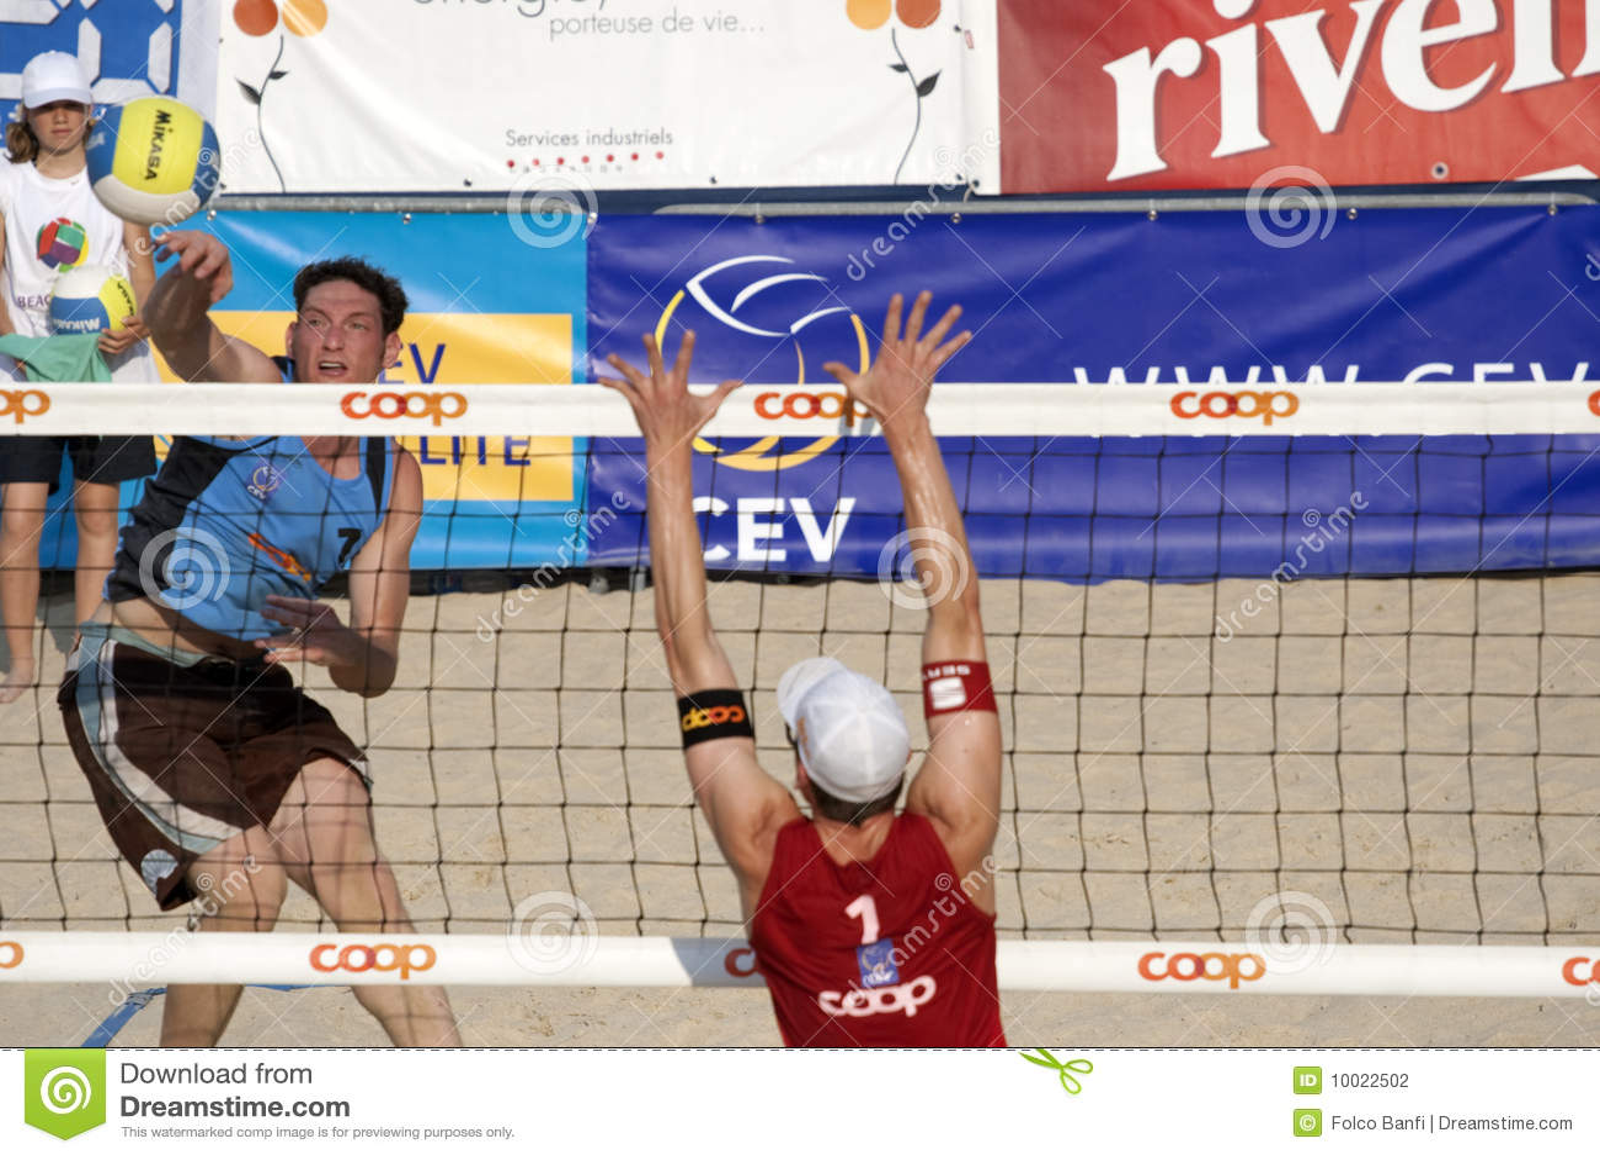 2009 torneo del voleo de la playa de FIVB CEV Lausanne